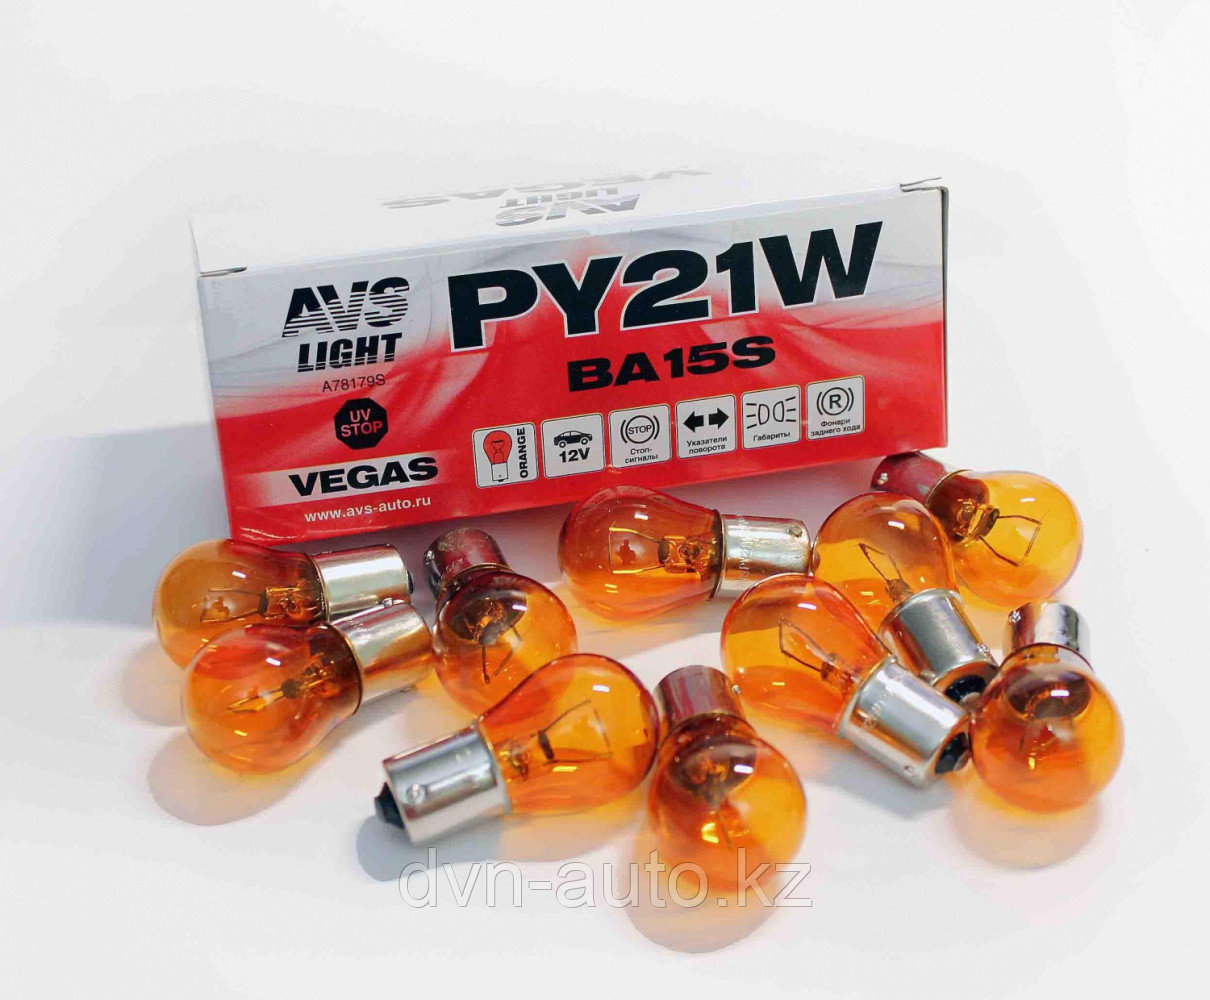 "Лампа AVS Vegas 12V. PY21W(BAU15S)""orange"" BOX(10 шт.) смещ.штифт"